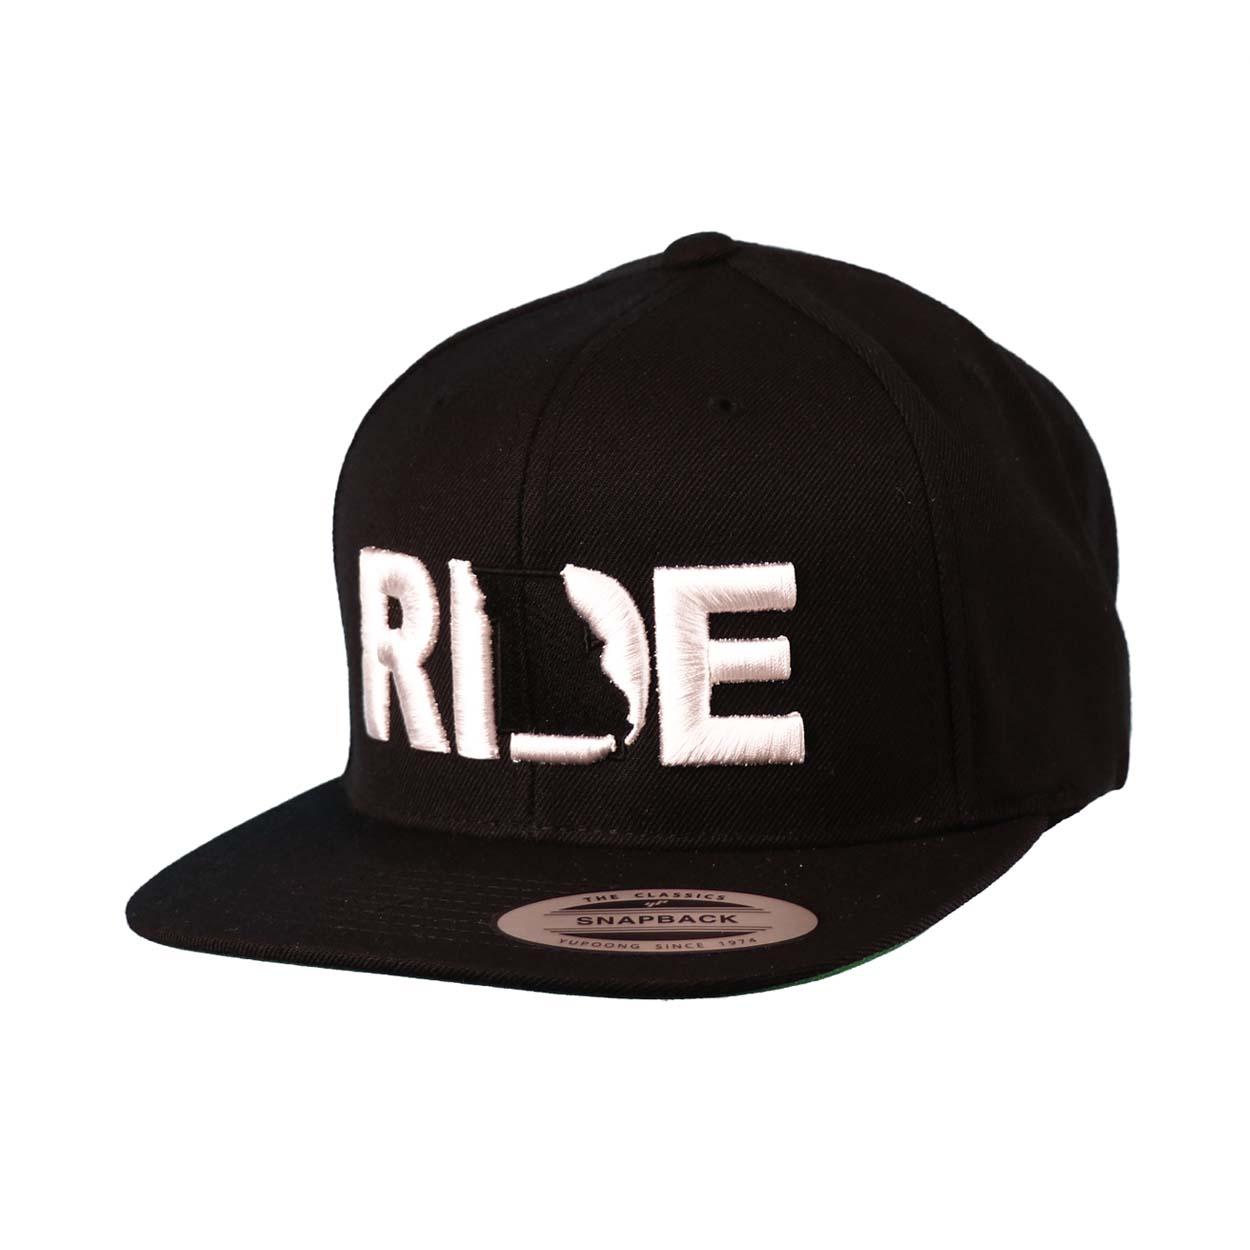 Ride Missouri Classic Embroidered  Snapback Flat Brim Hat Black/White